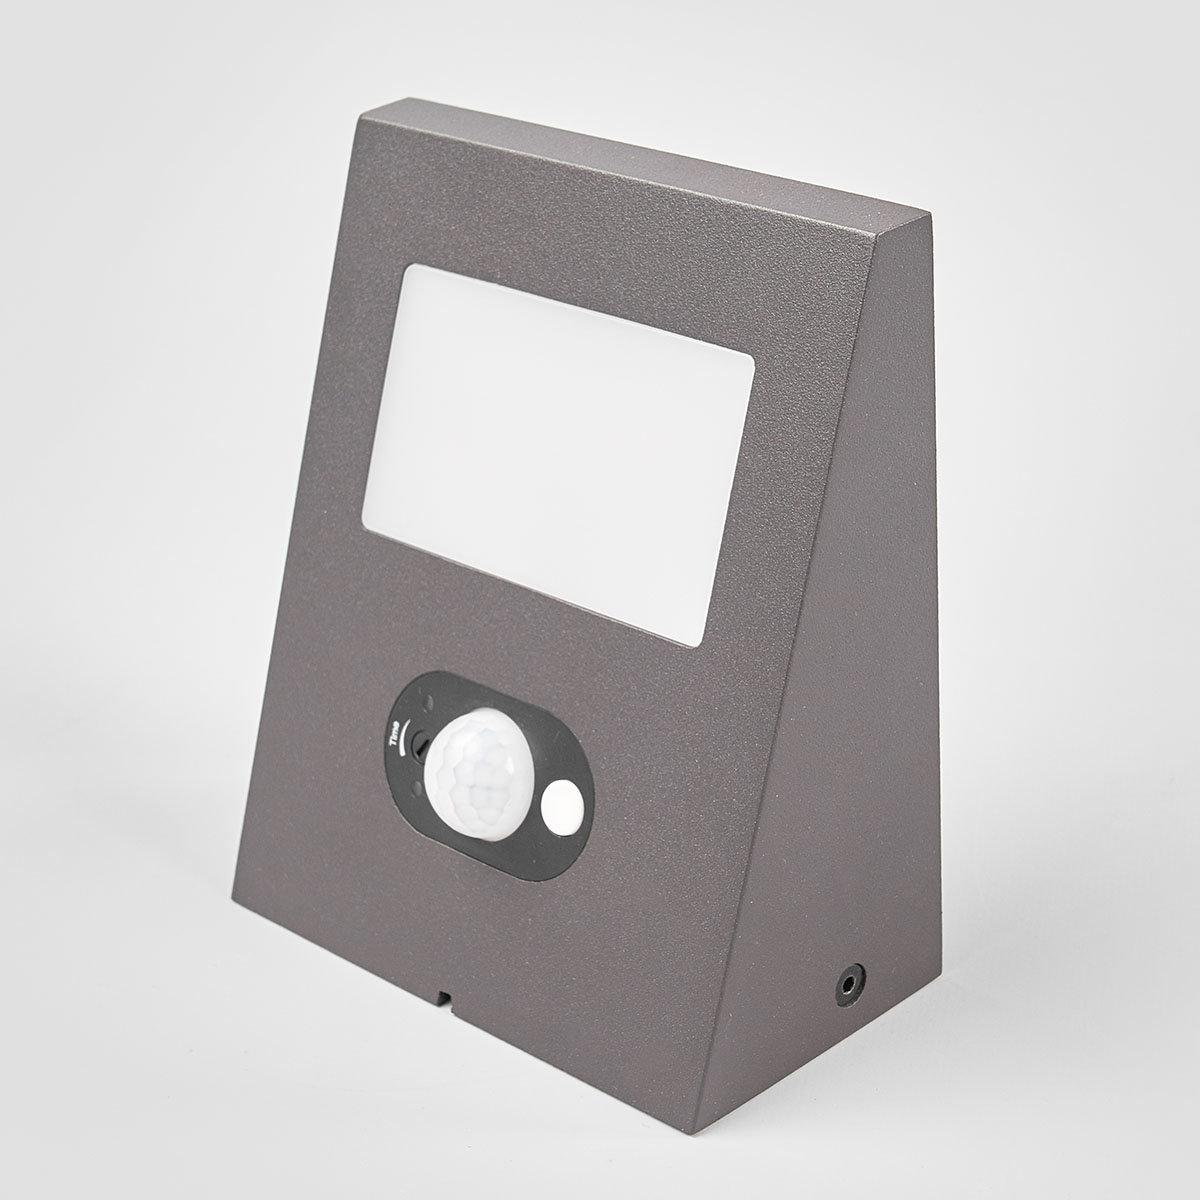 Solar-LED-Außenwandleuchte Felin mit Bewegungsmelder, 6,6x12,5x14,5 cm, Aluminium, grau | #3